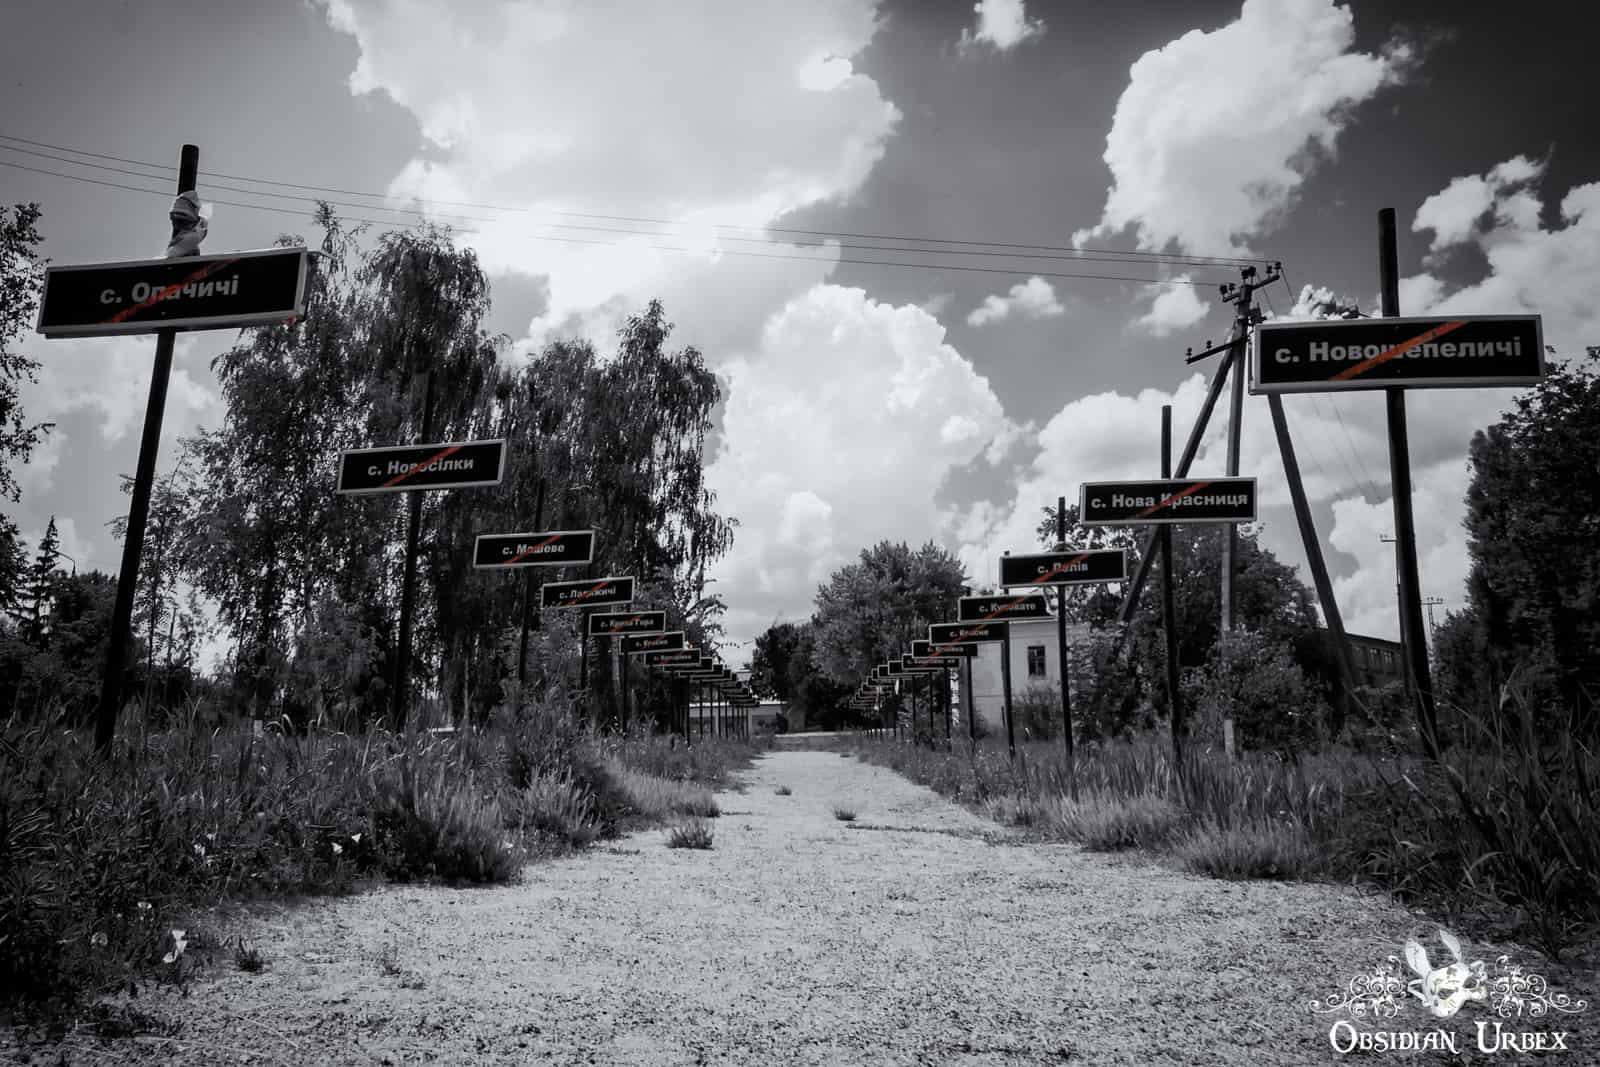 Chernobyl Nuclear Power Plant - Obsidian Urbex Photography ...